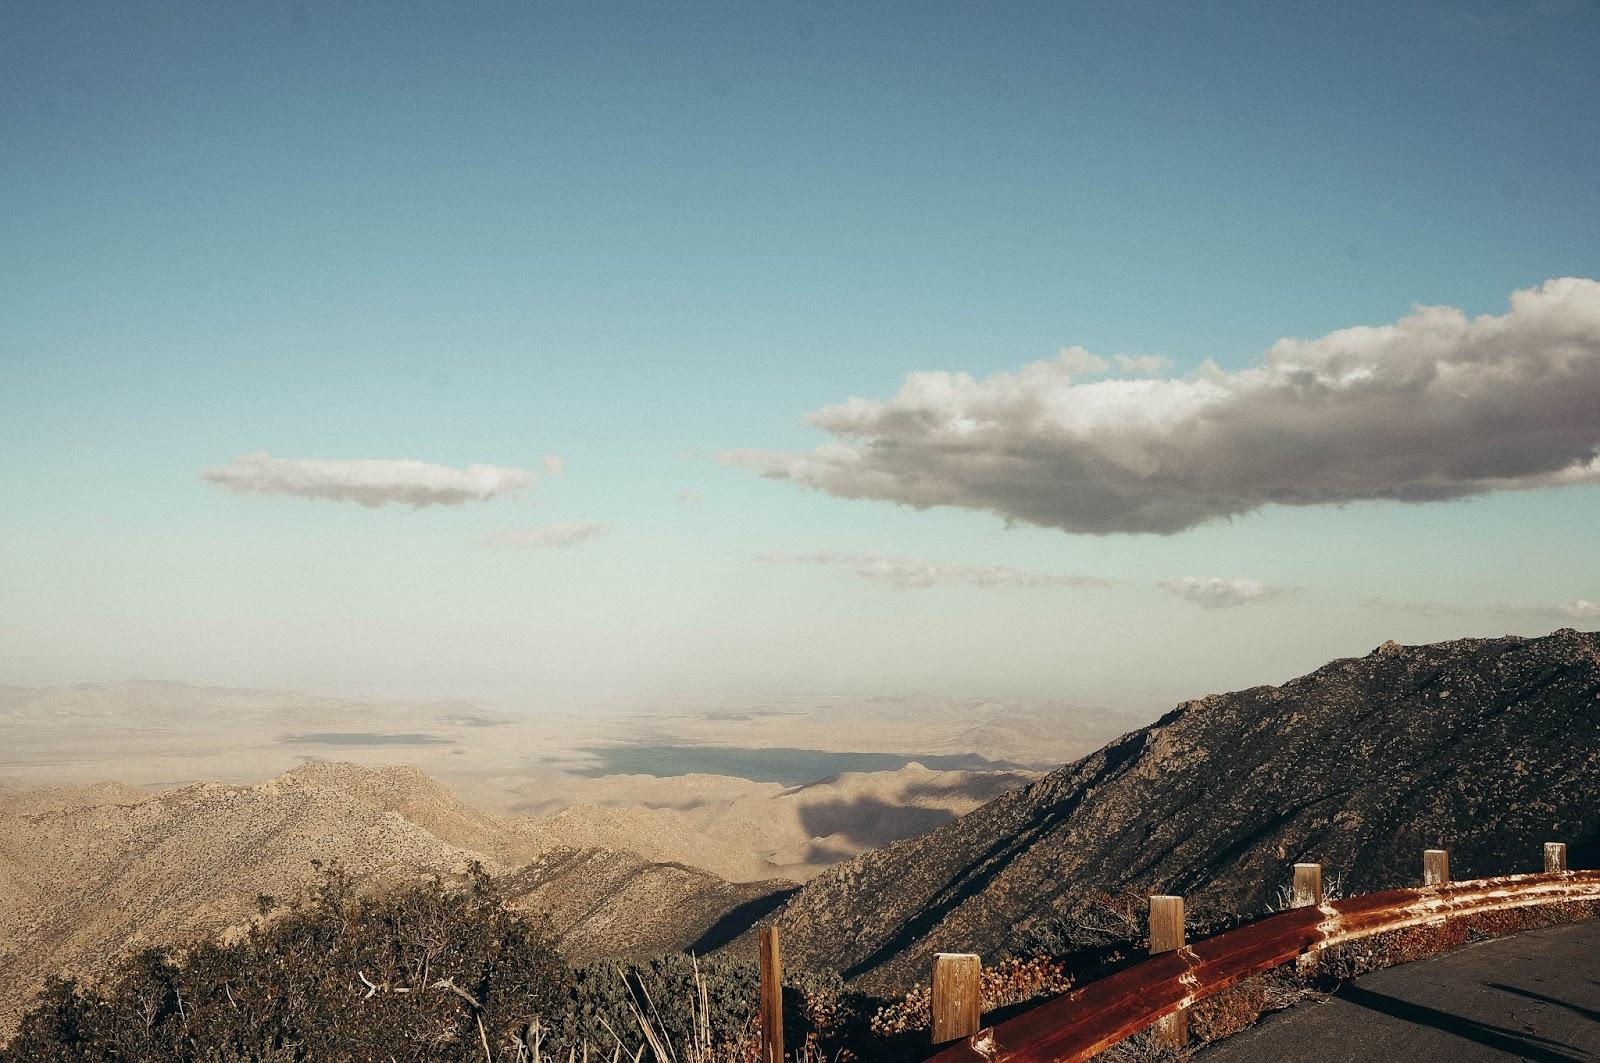 Mount Laguna Desert View